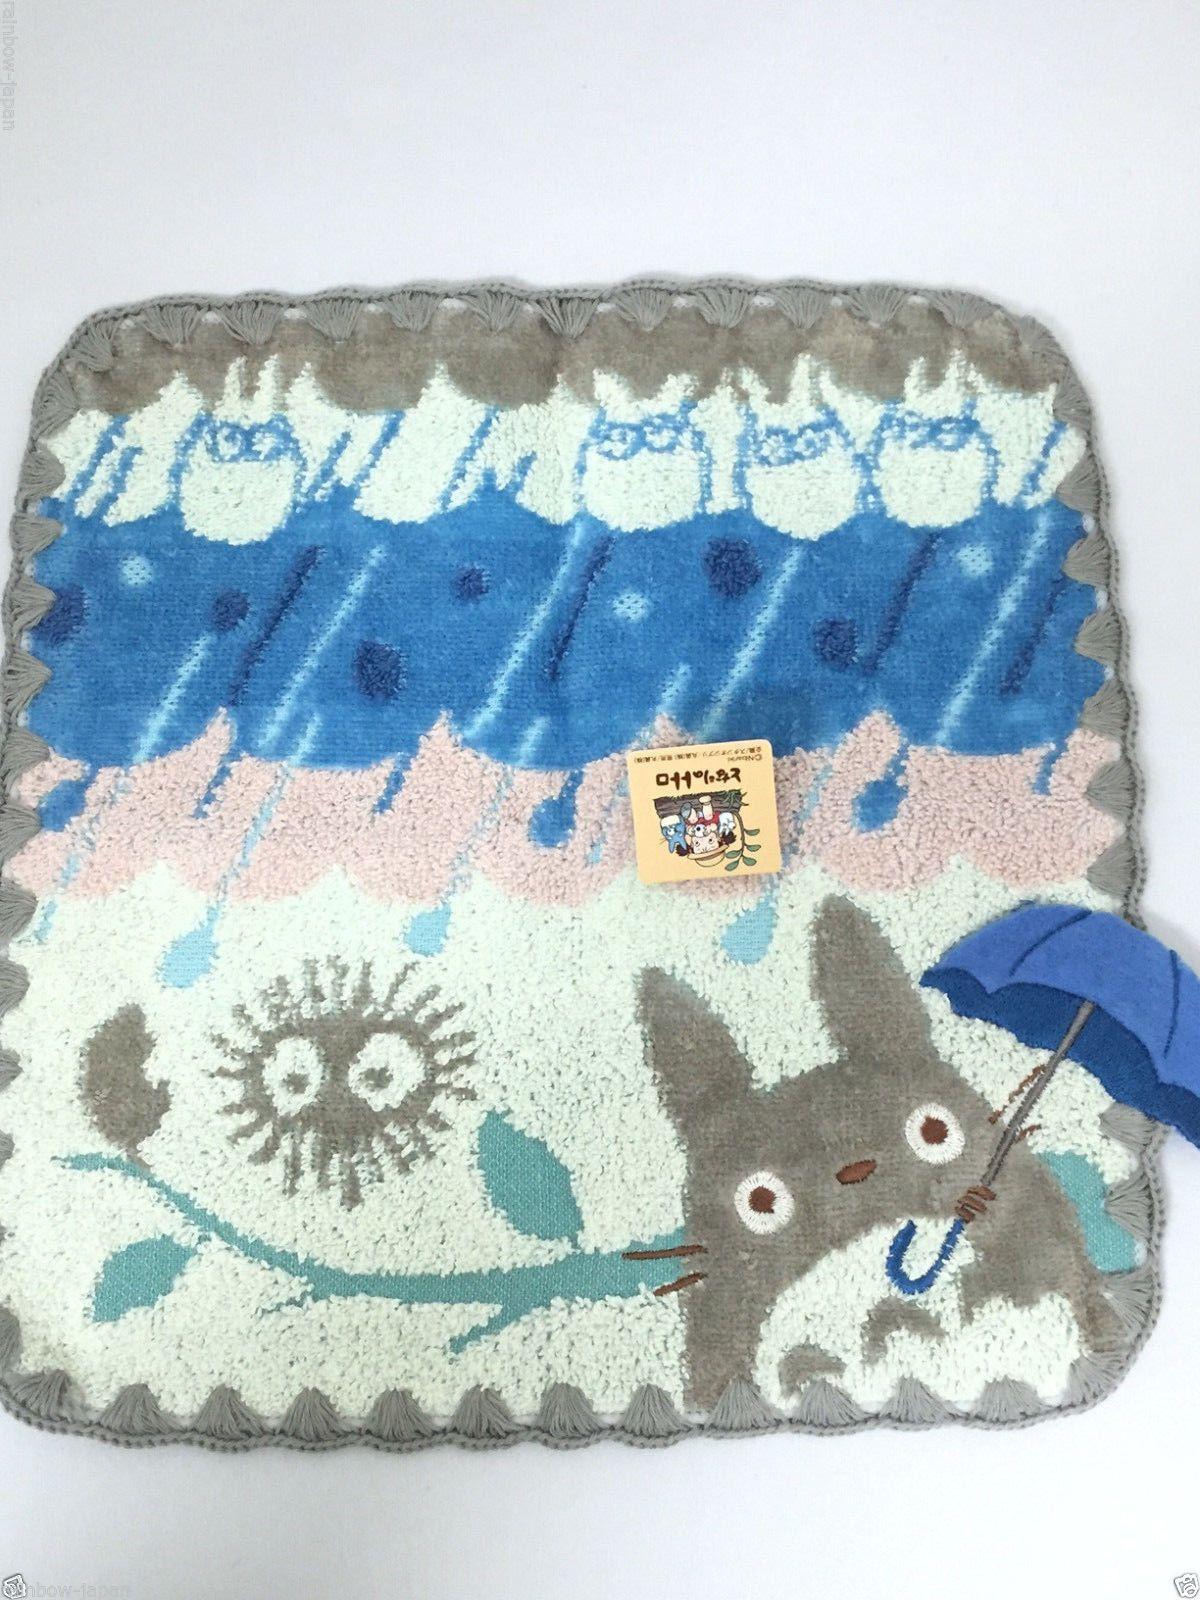 My Neighbor Totoro Hand Towel 25.5 x 25.5cm Cotton 100% Studio Ghibli 03142